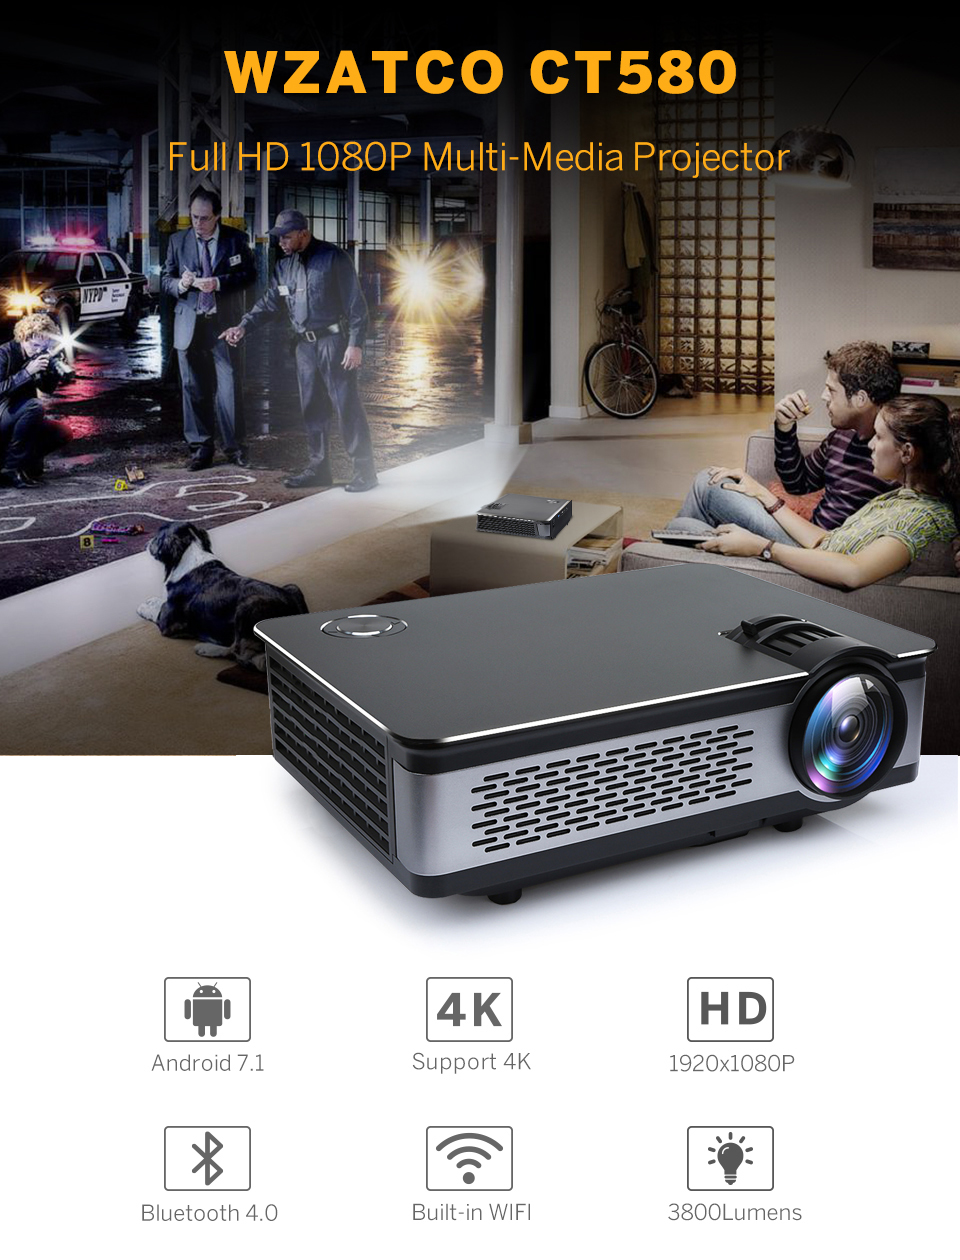 WZATCO-CT580-Full-HD-1080P-Projector_01